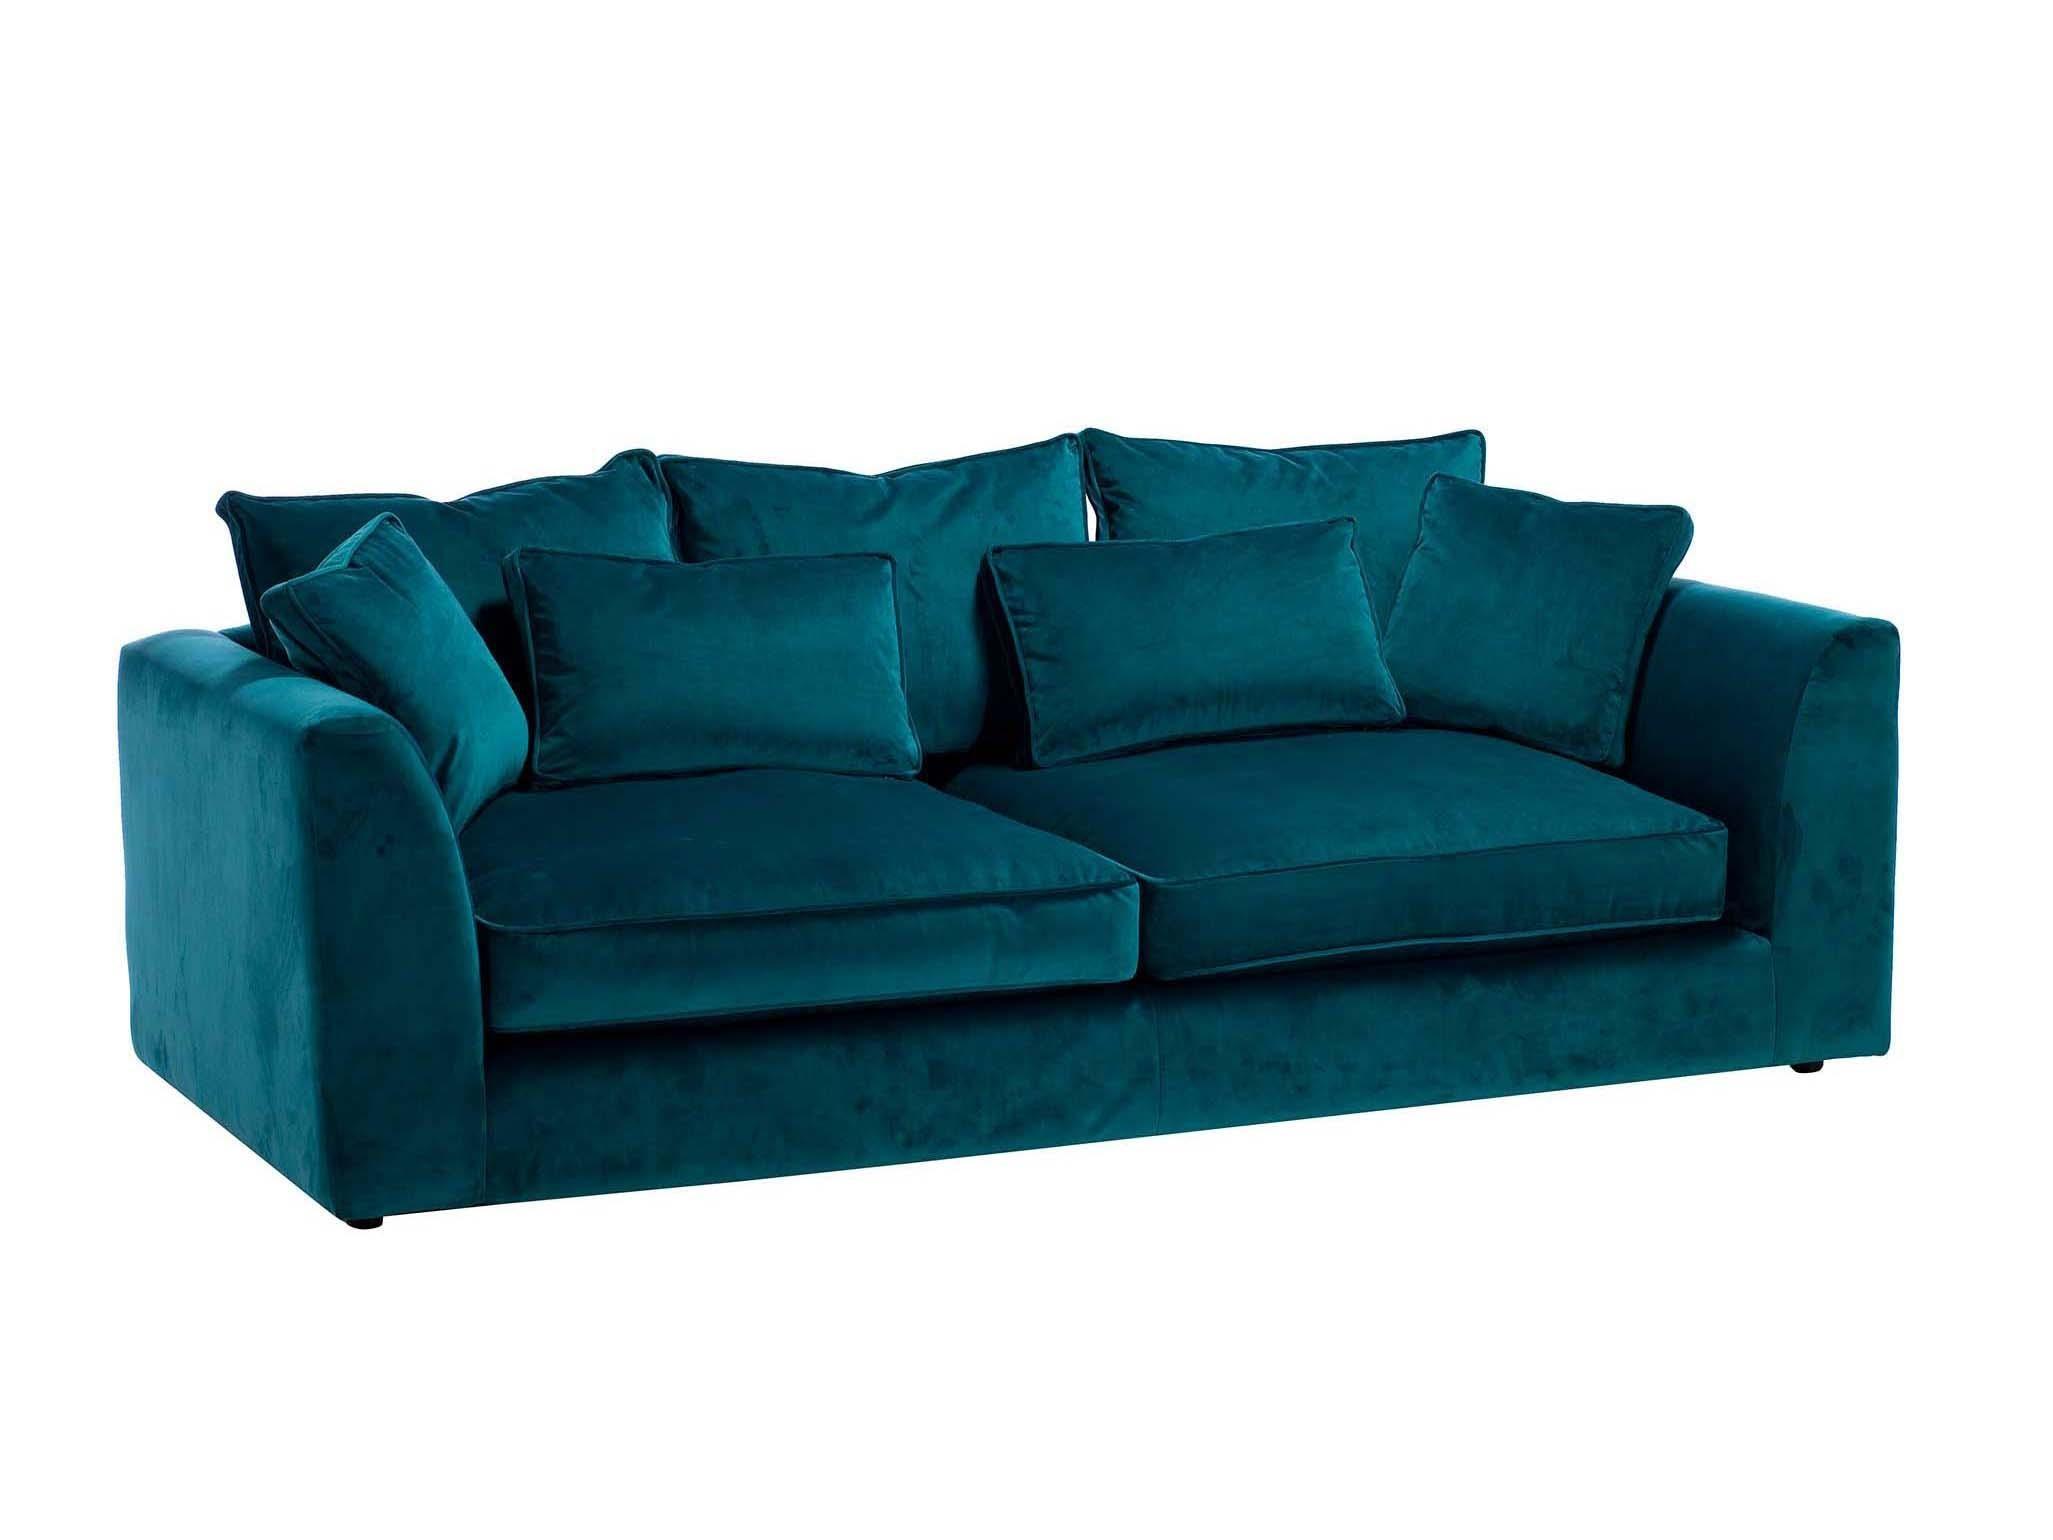 Outstanding 10 Best Sofas The Independent Interior Design Ideas Truasarkarijobsexamcom